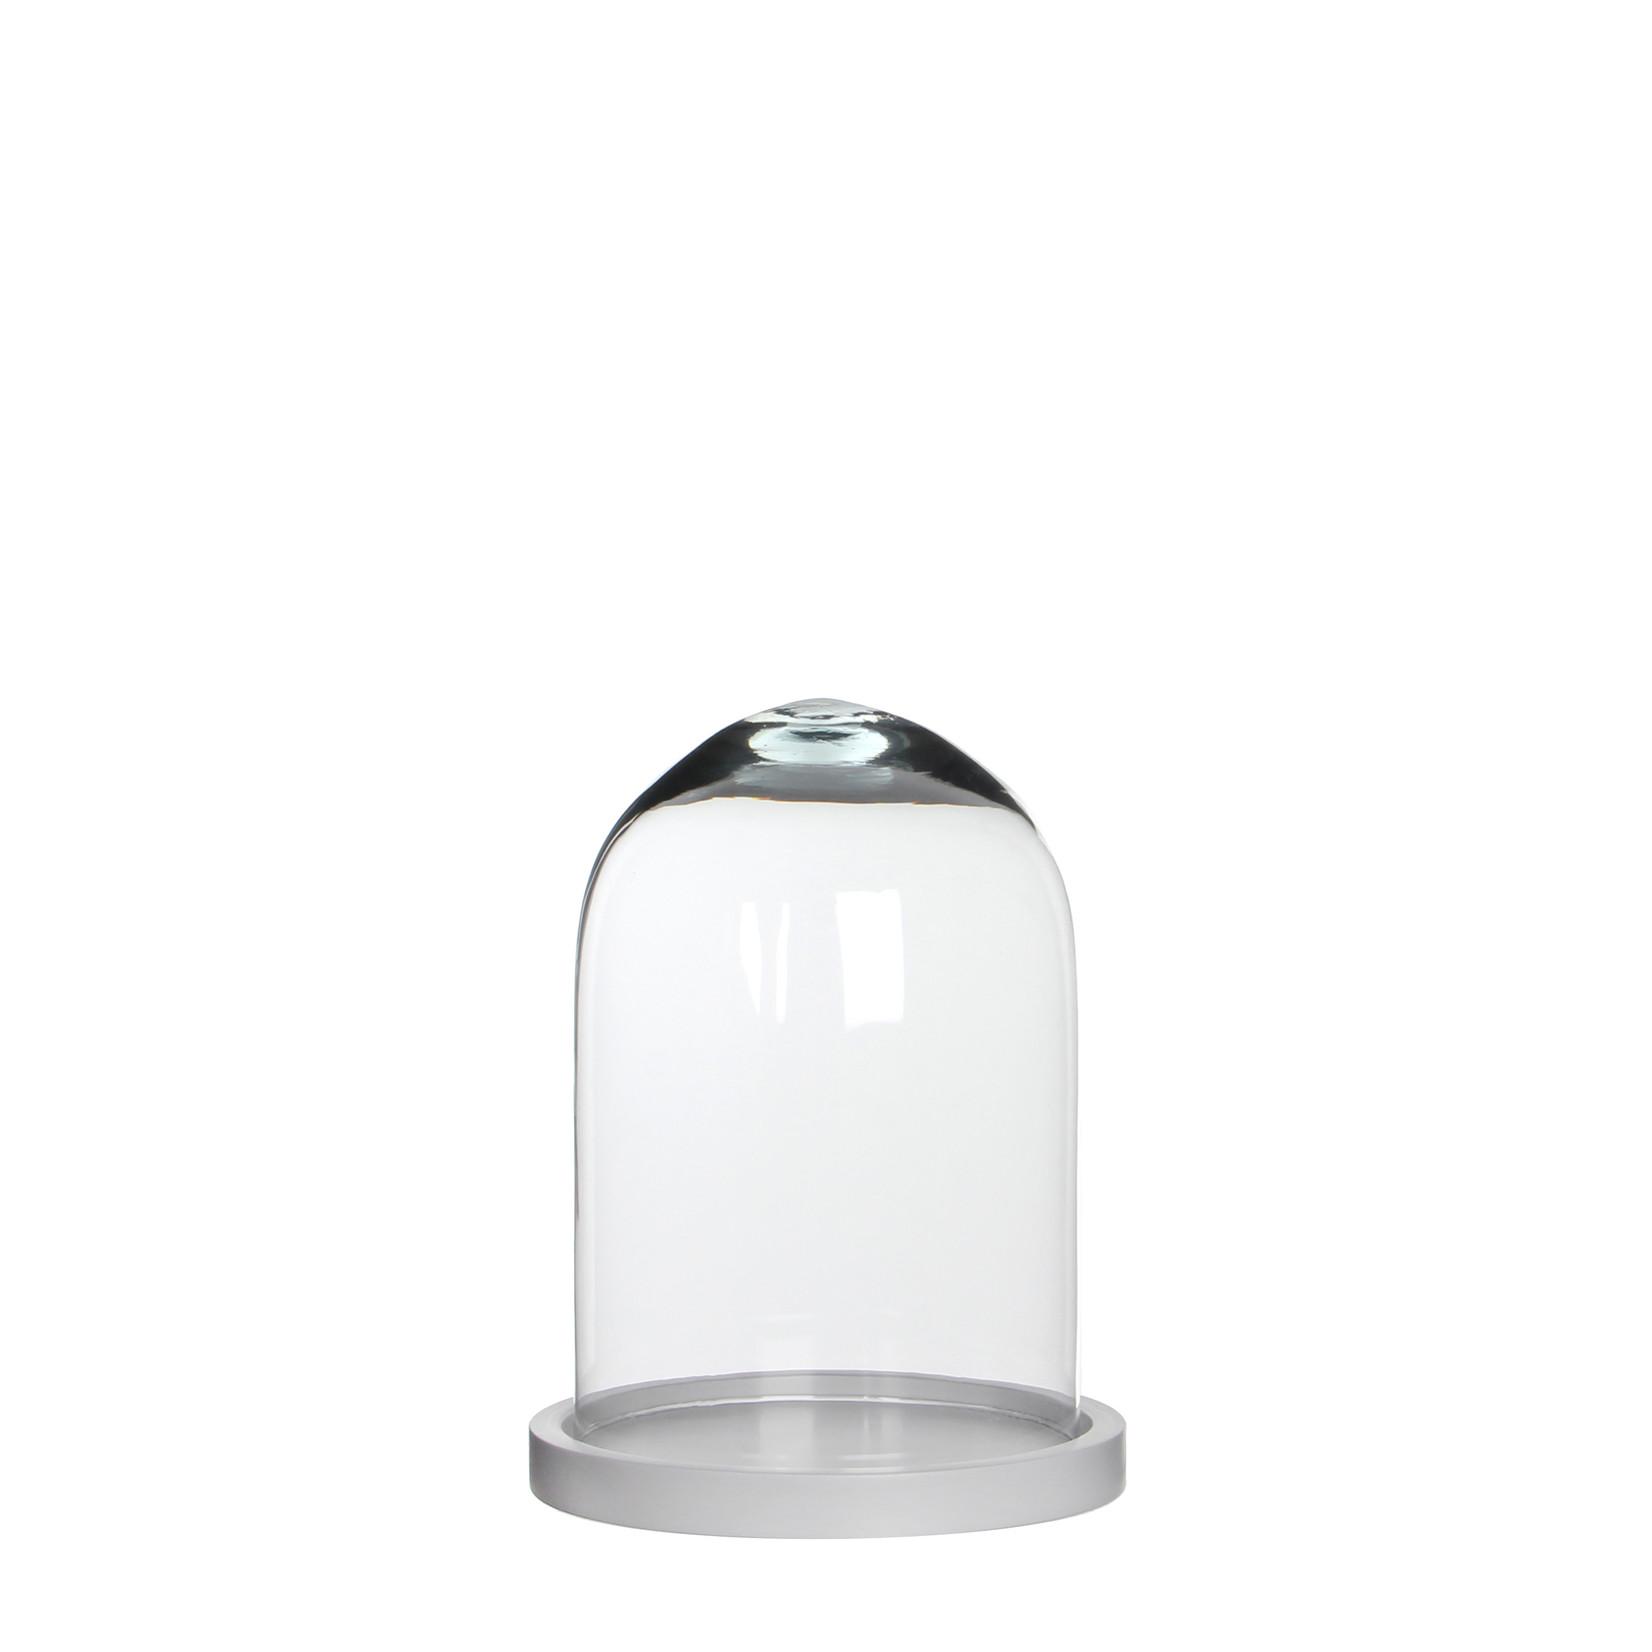 MiCa 242305 Bell jar Hella white S